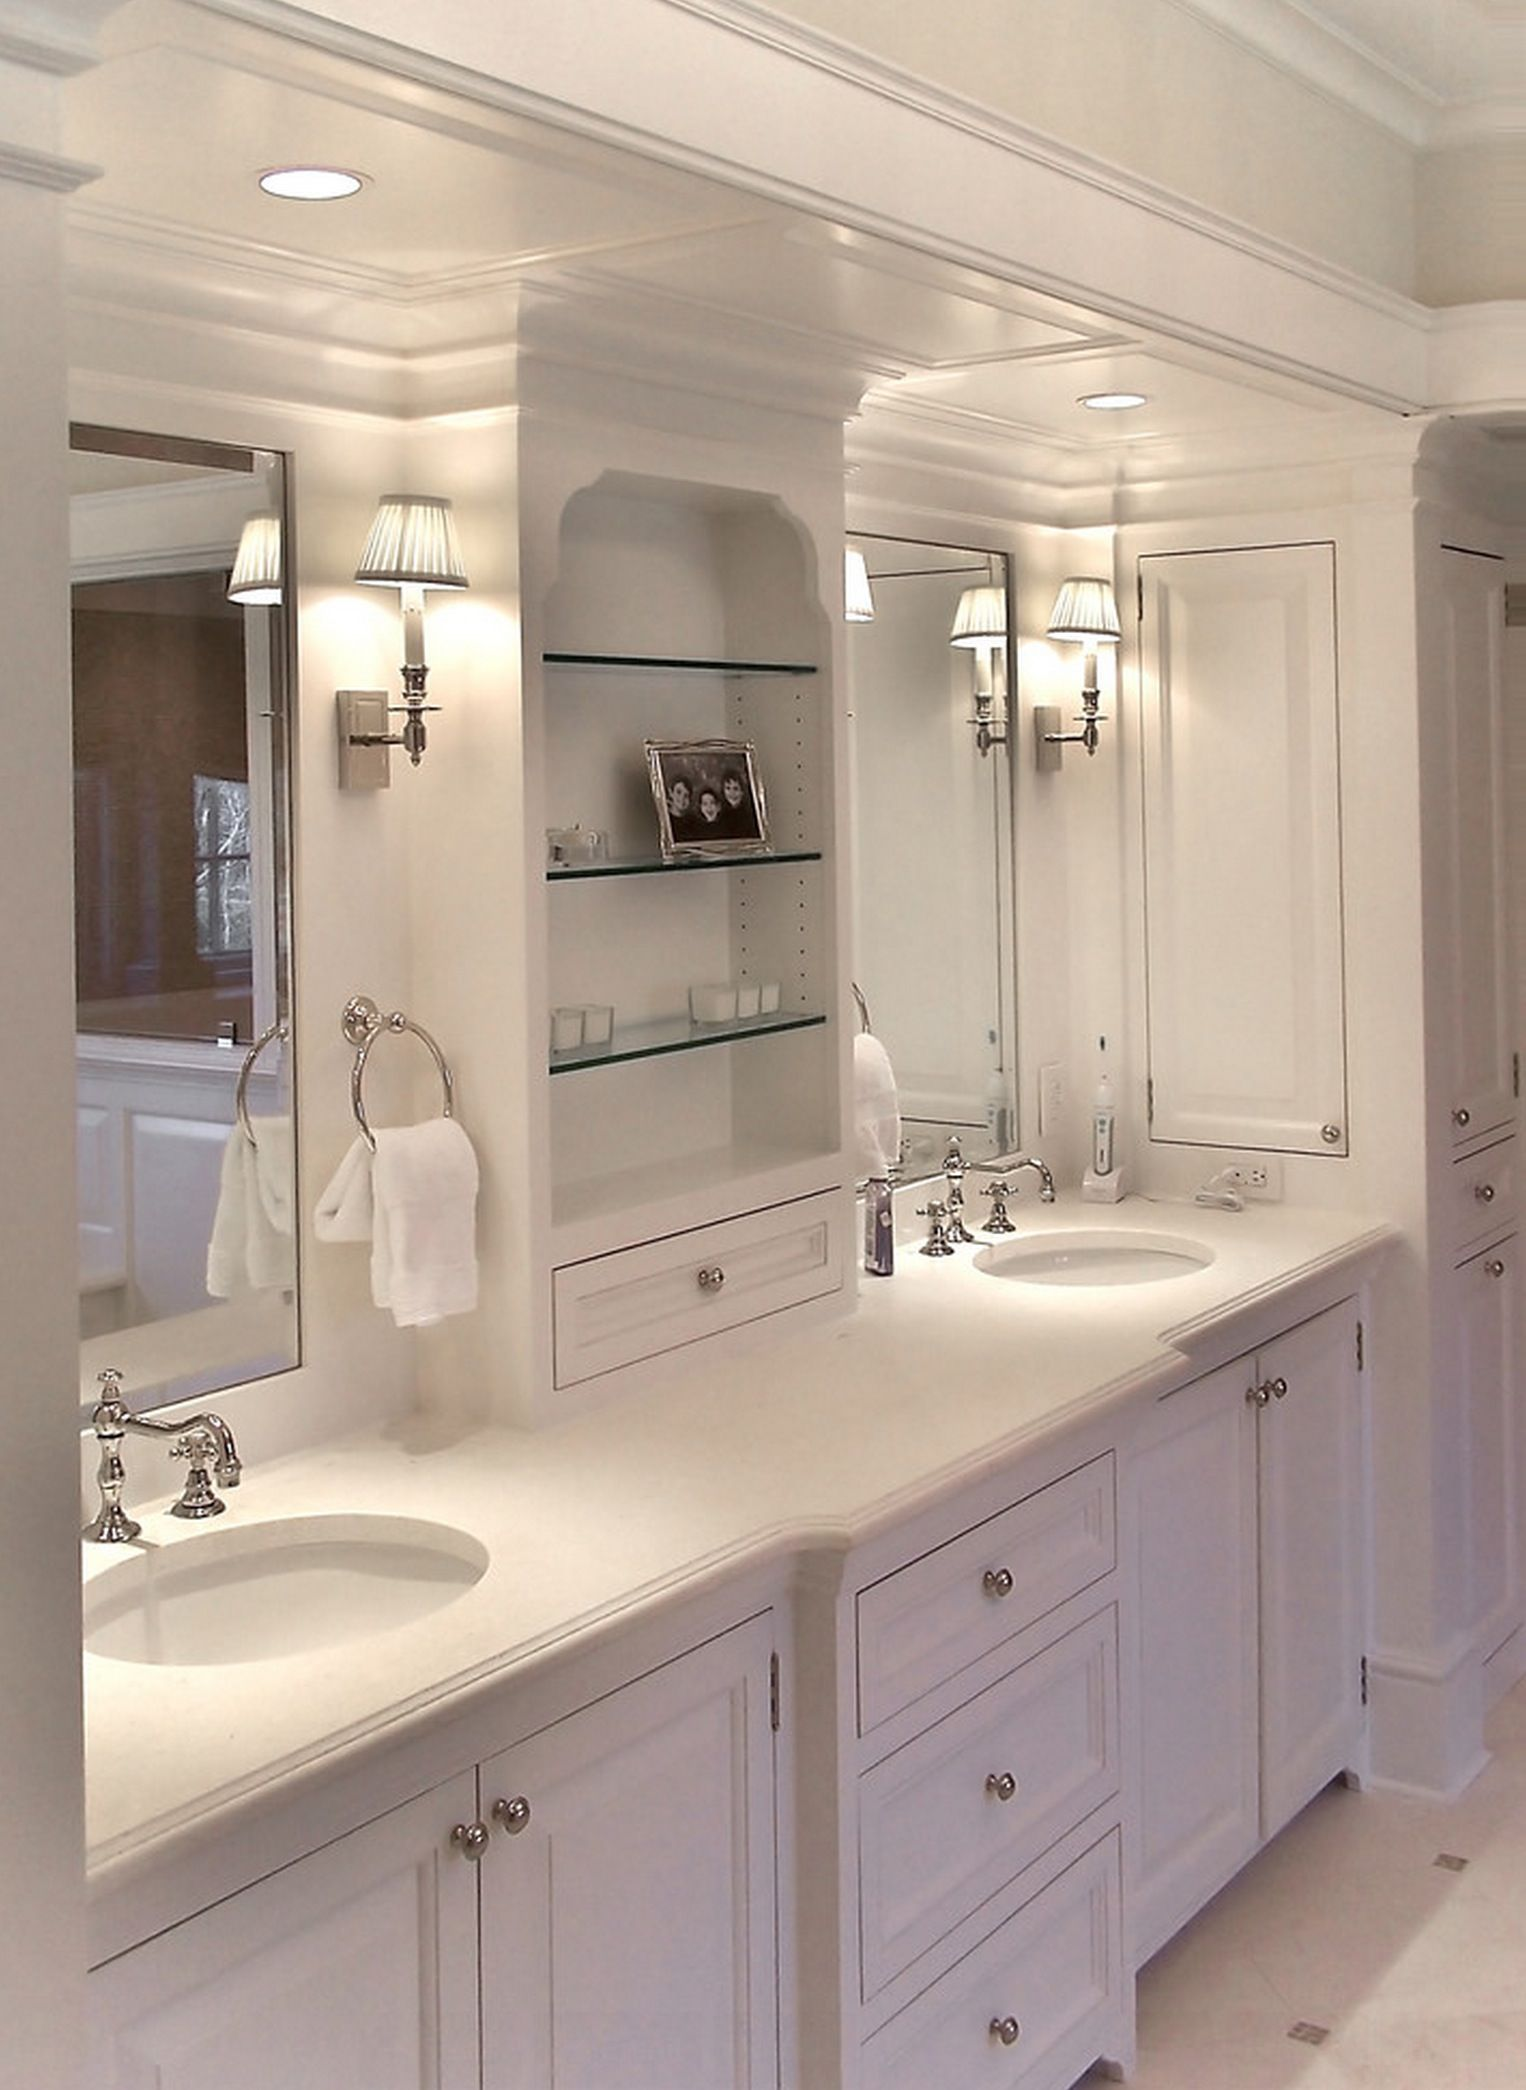 Bathroom Design August 2014 100 | Bathroom | Pinterest | August 2014 ...